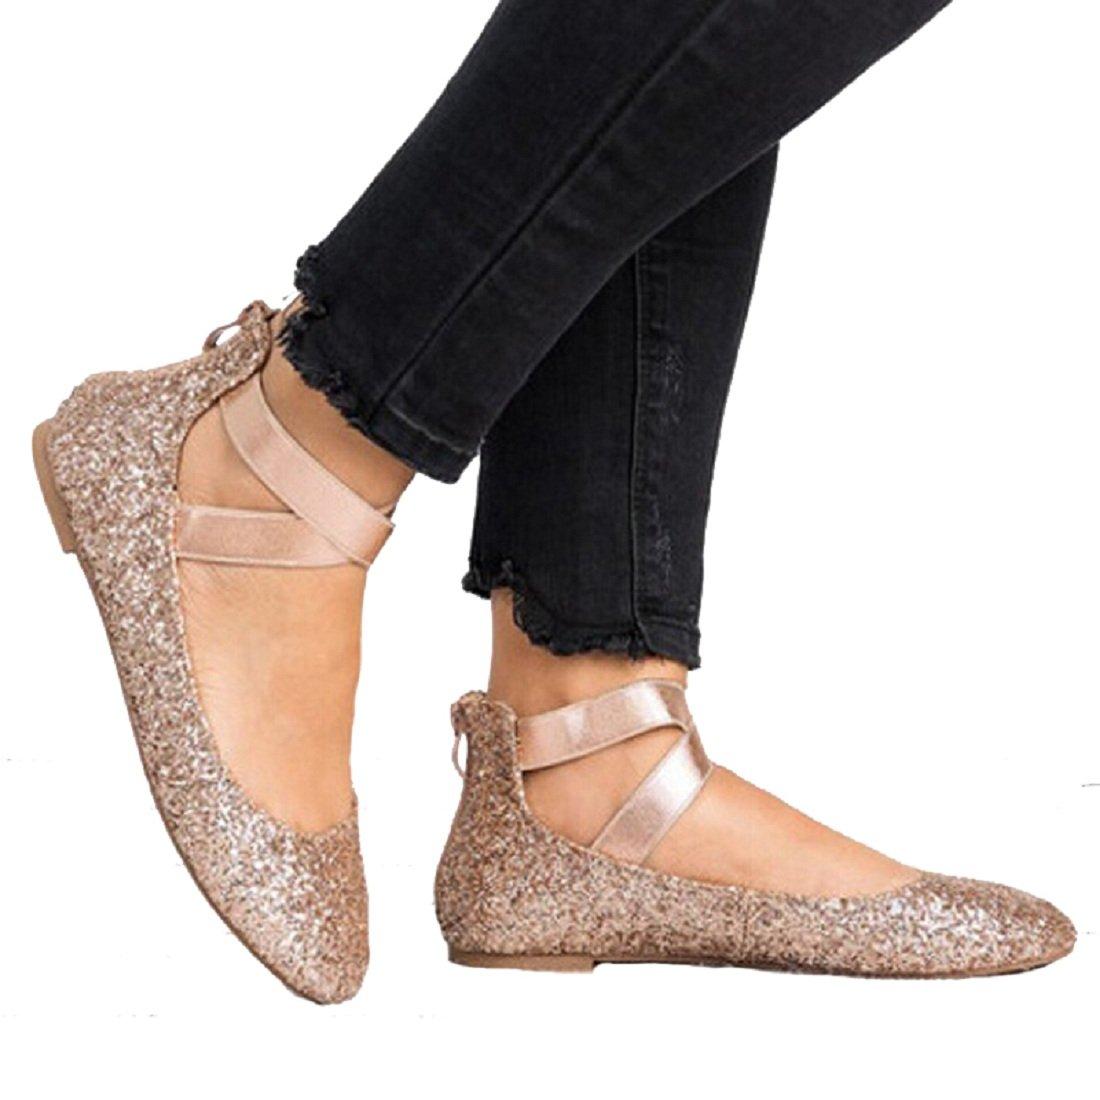 DOTACOKO Women Classic Elastic Ankle Flats Criss Cross Straps Slip on Round Toe Casual Ballet Shoes B07F6C95FM 7 B(M) US|Gold